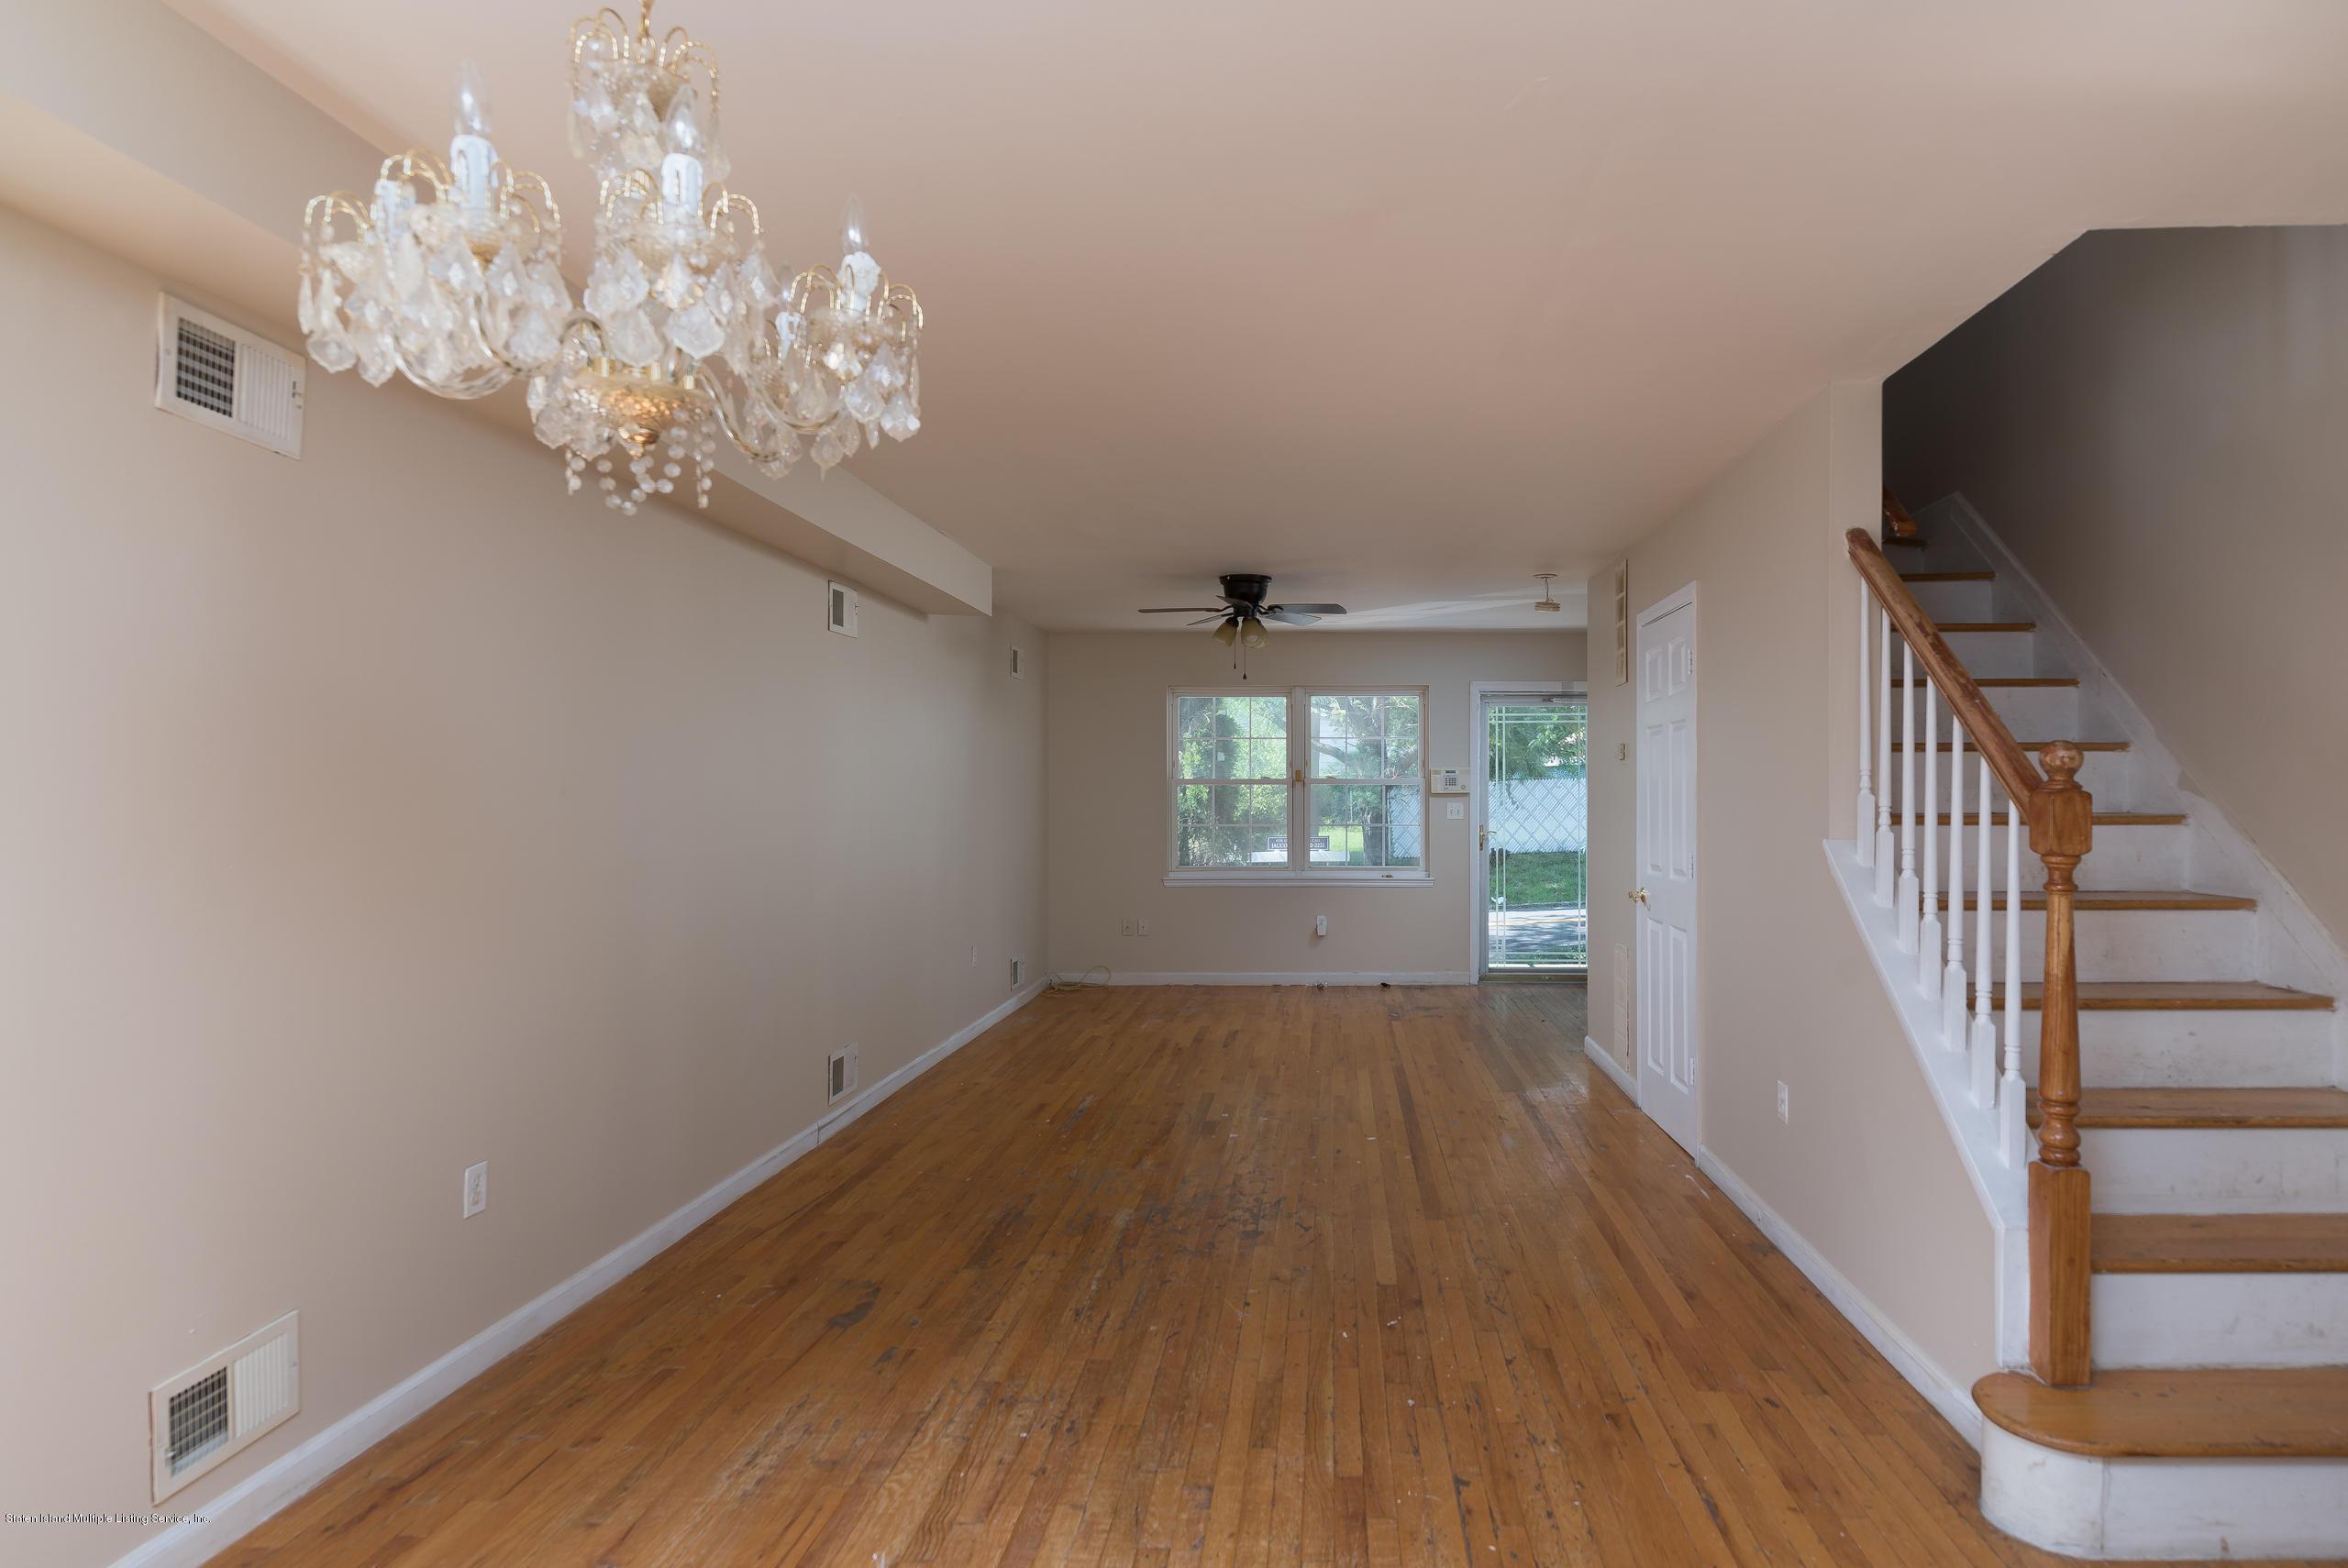 Single Family - Semi-Attached 230 Holden Boulevard  Staten Island, NY 10314, MLS-1130208-5